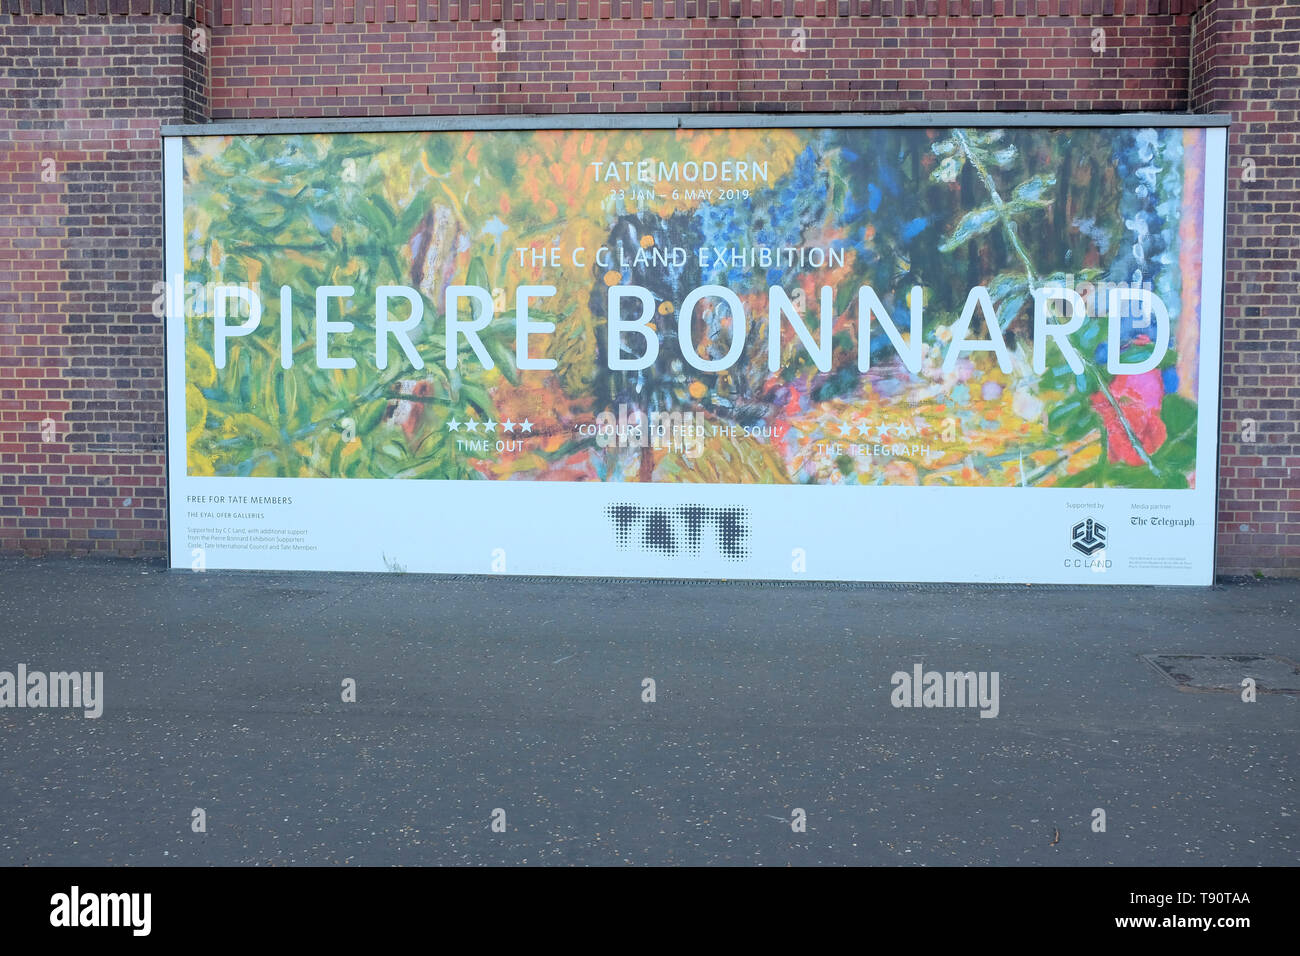 Artist Pierre Bonnard at the Tate, London, UK. Stock Photo